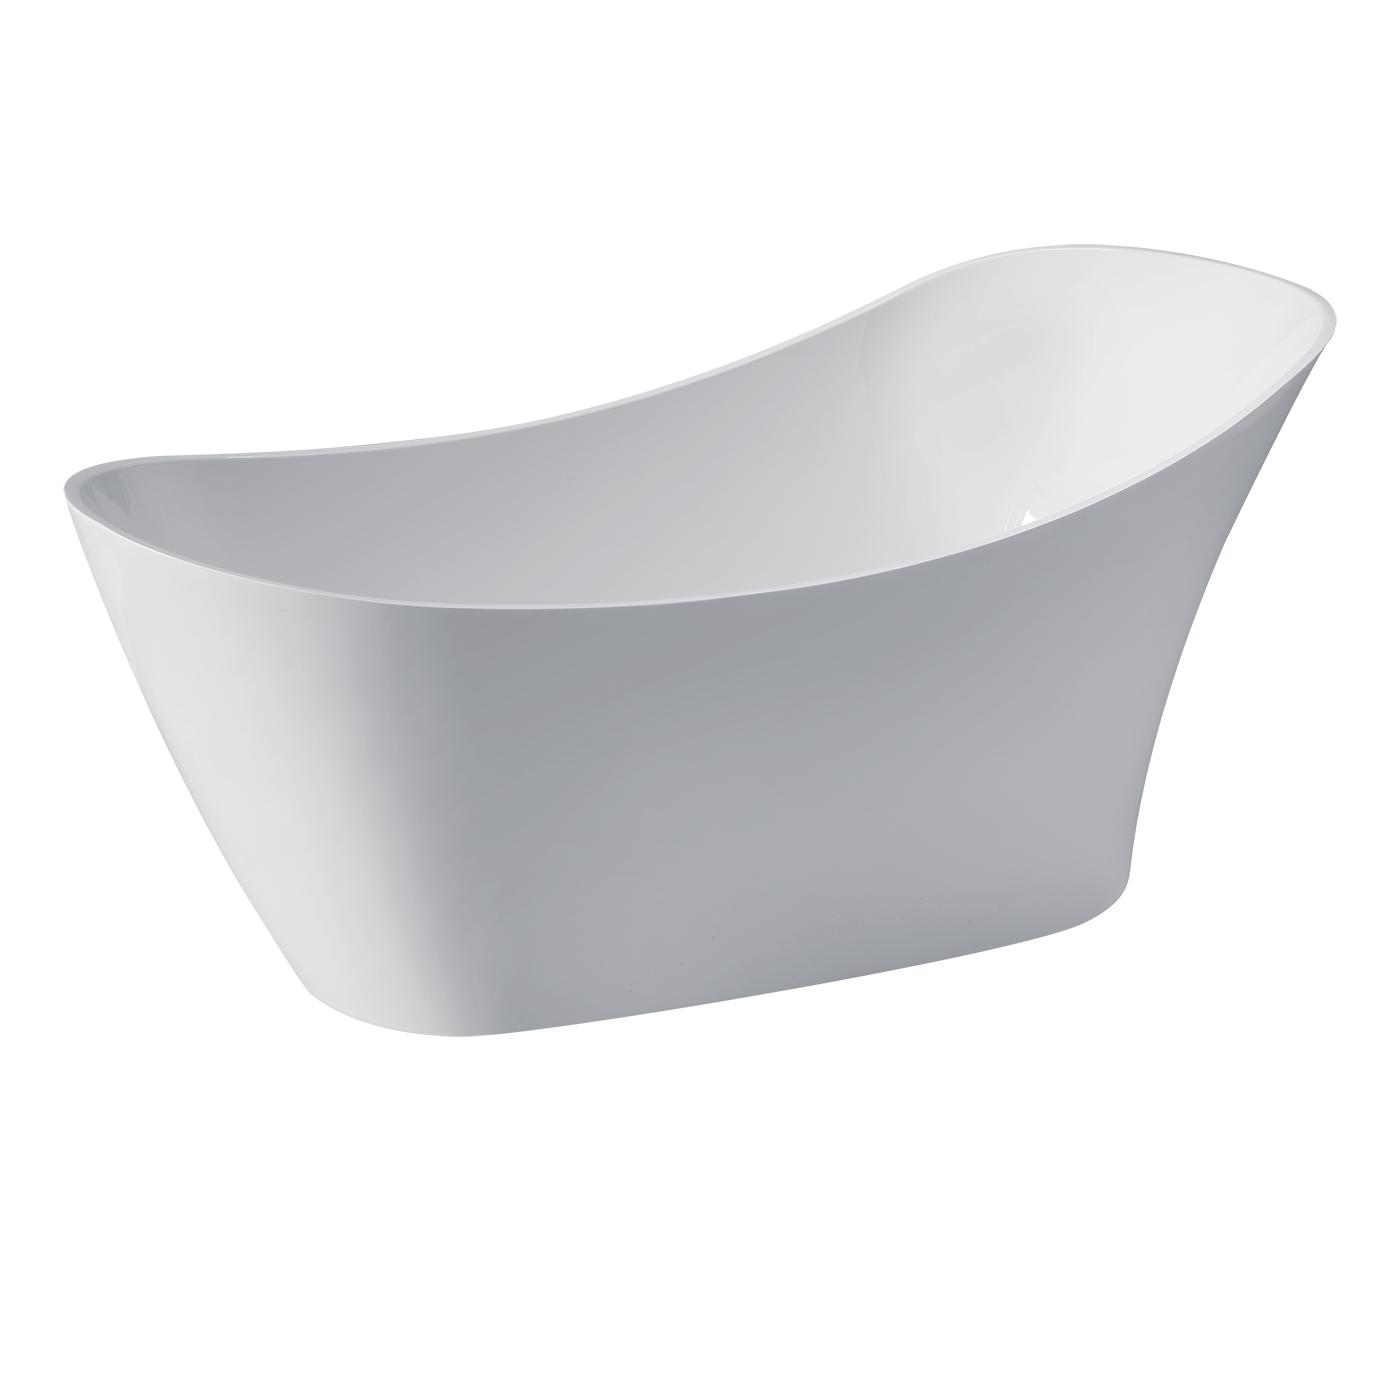 Vasca Da Bagno Kerasan : Vasca da bagno design waldorf